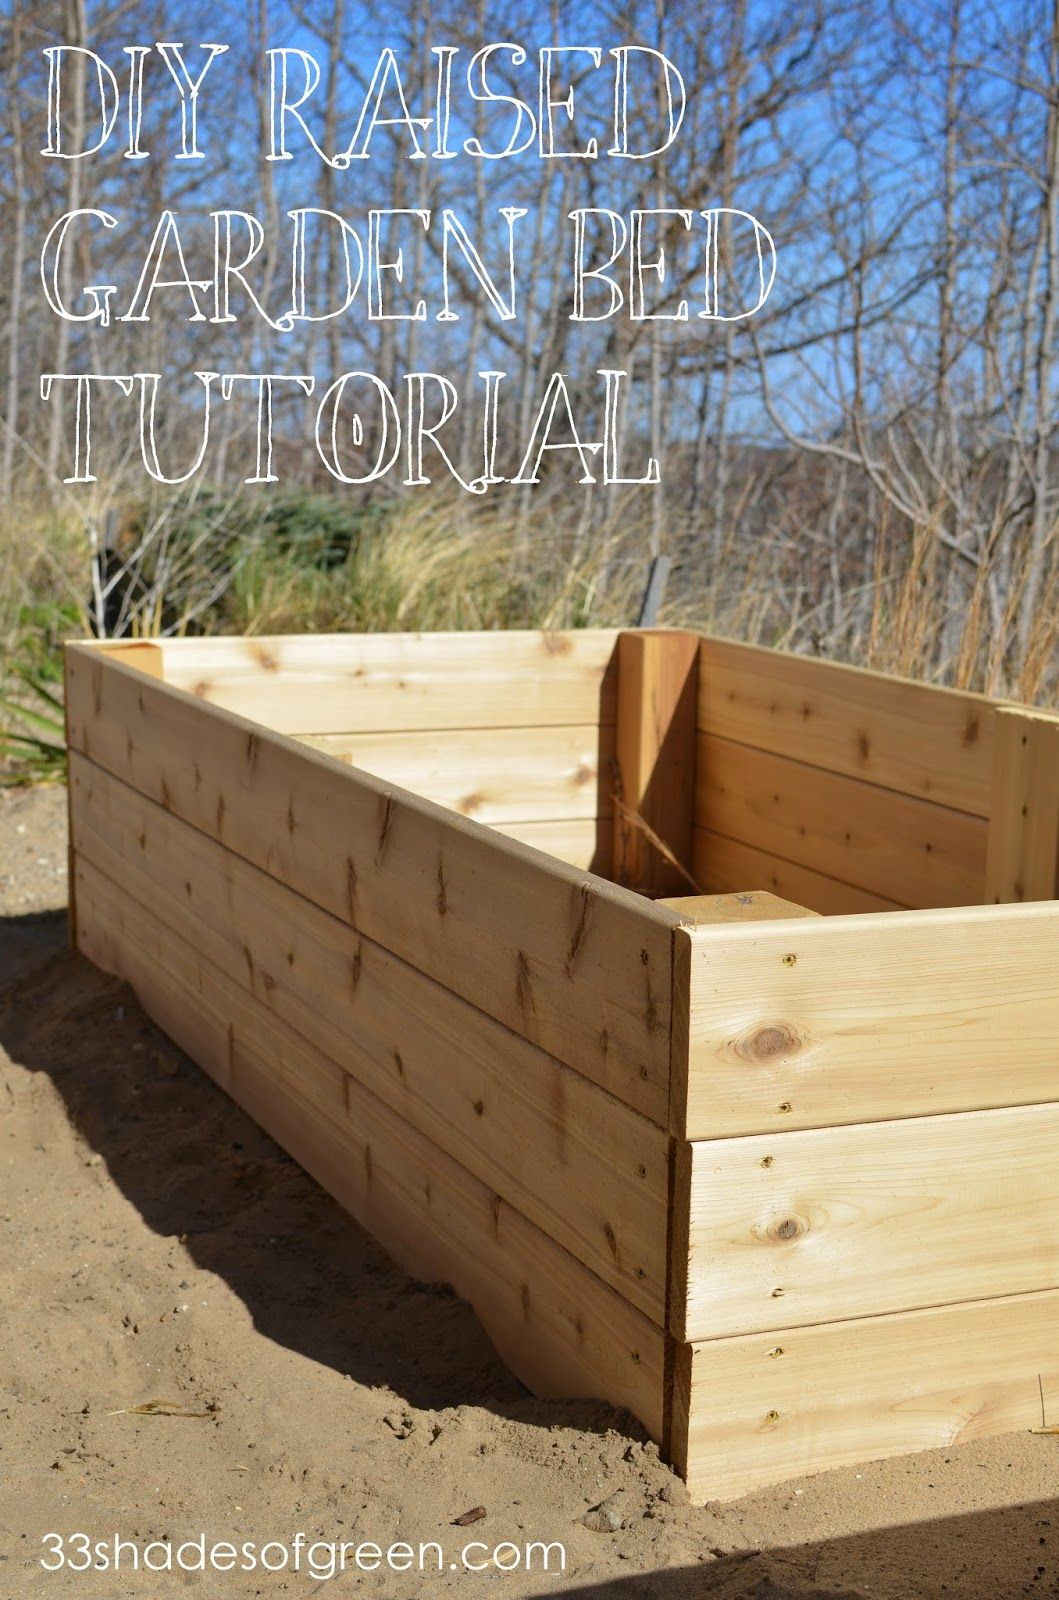 Easy DIY Raised Garden Bed Tutorial (33 Shades of Green